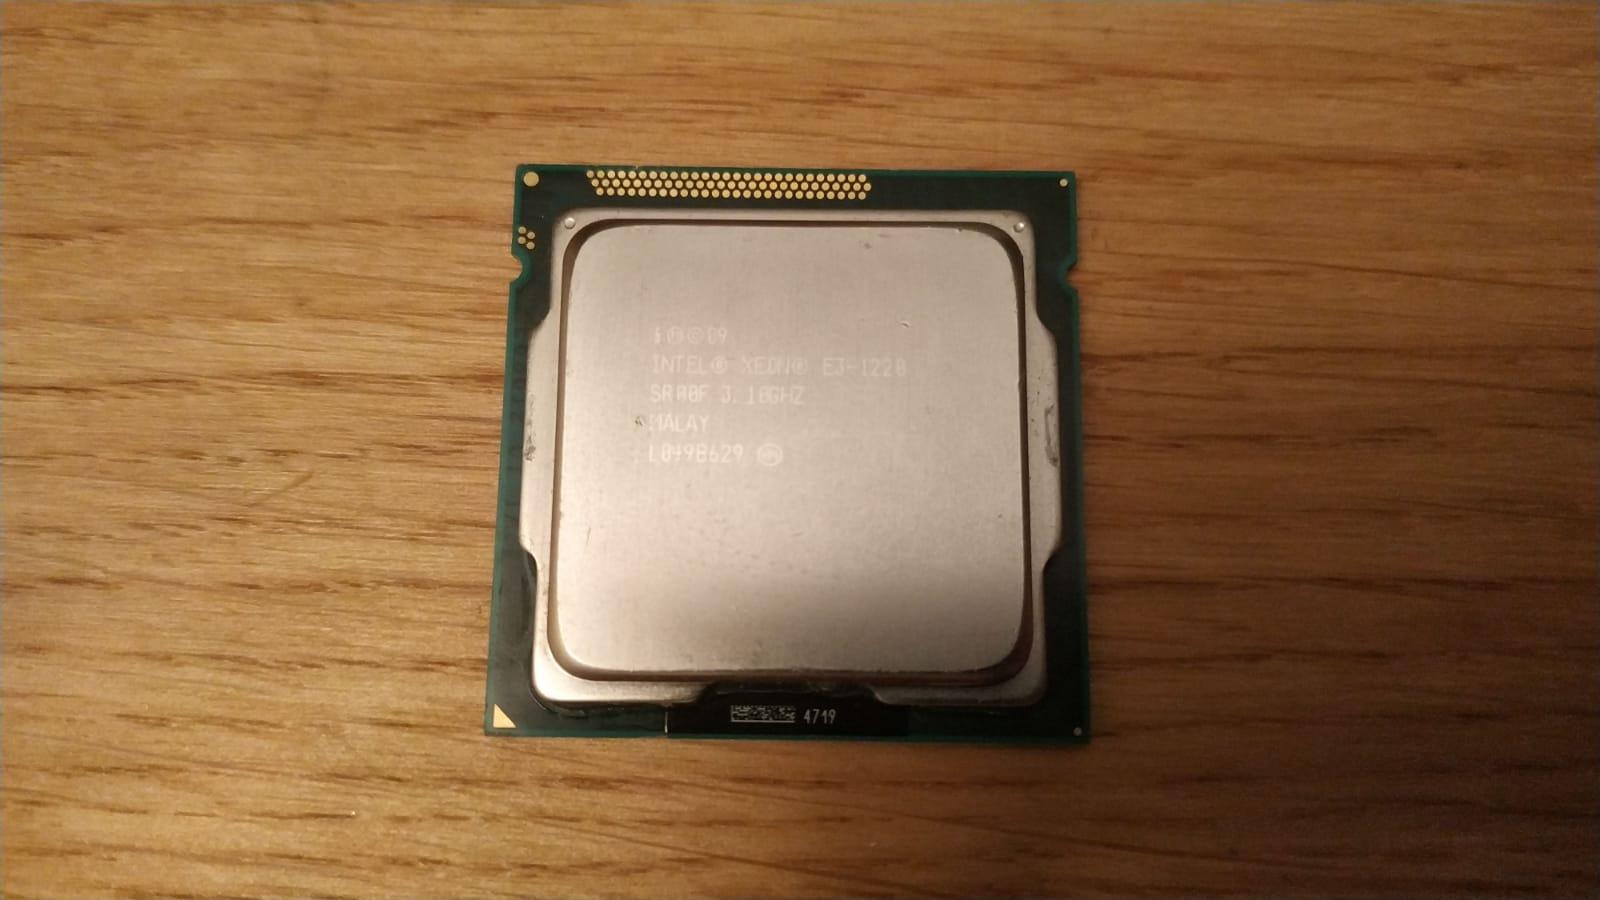 Intel Xeon E3 1220